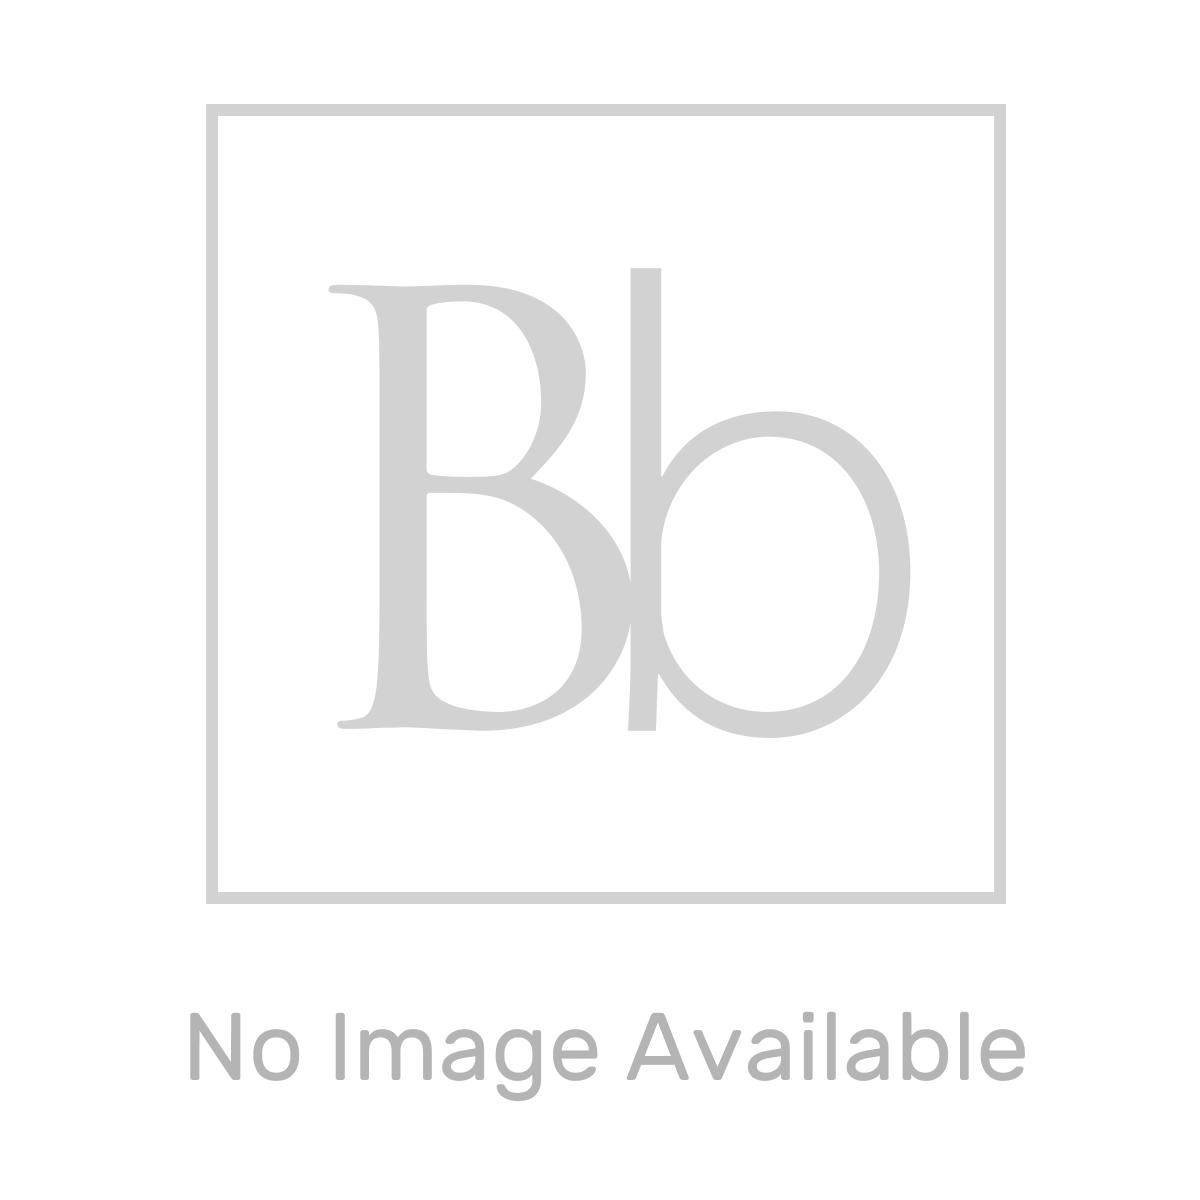 RAK Surface Charcoal Rustic Tile 600 x 600mm